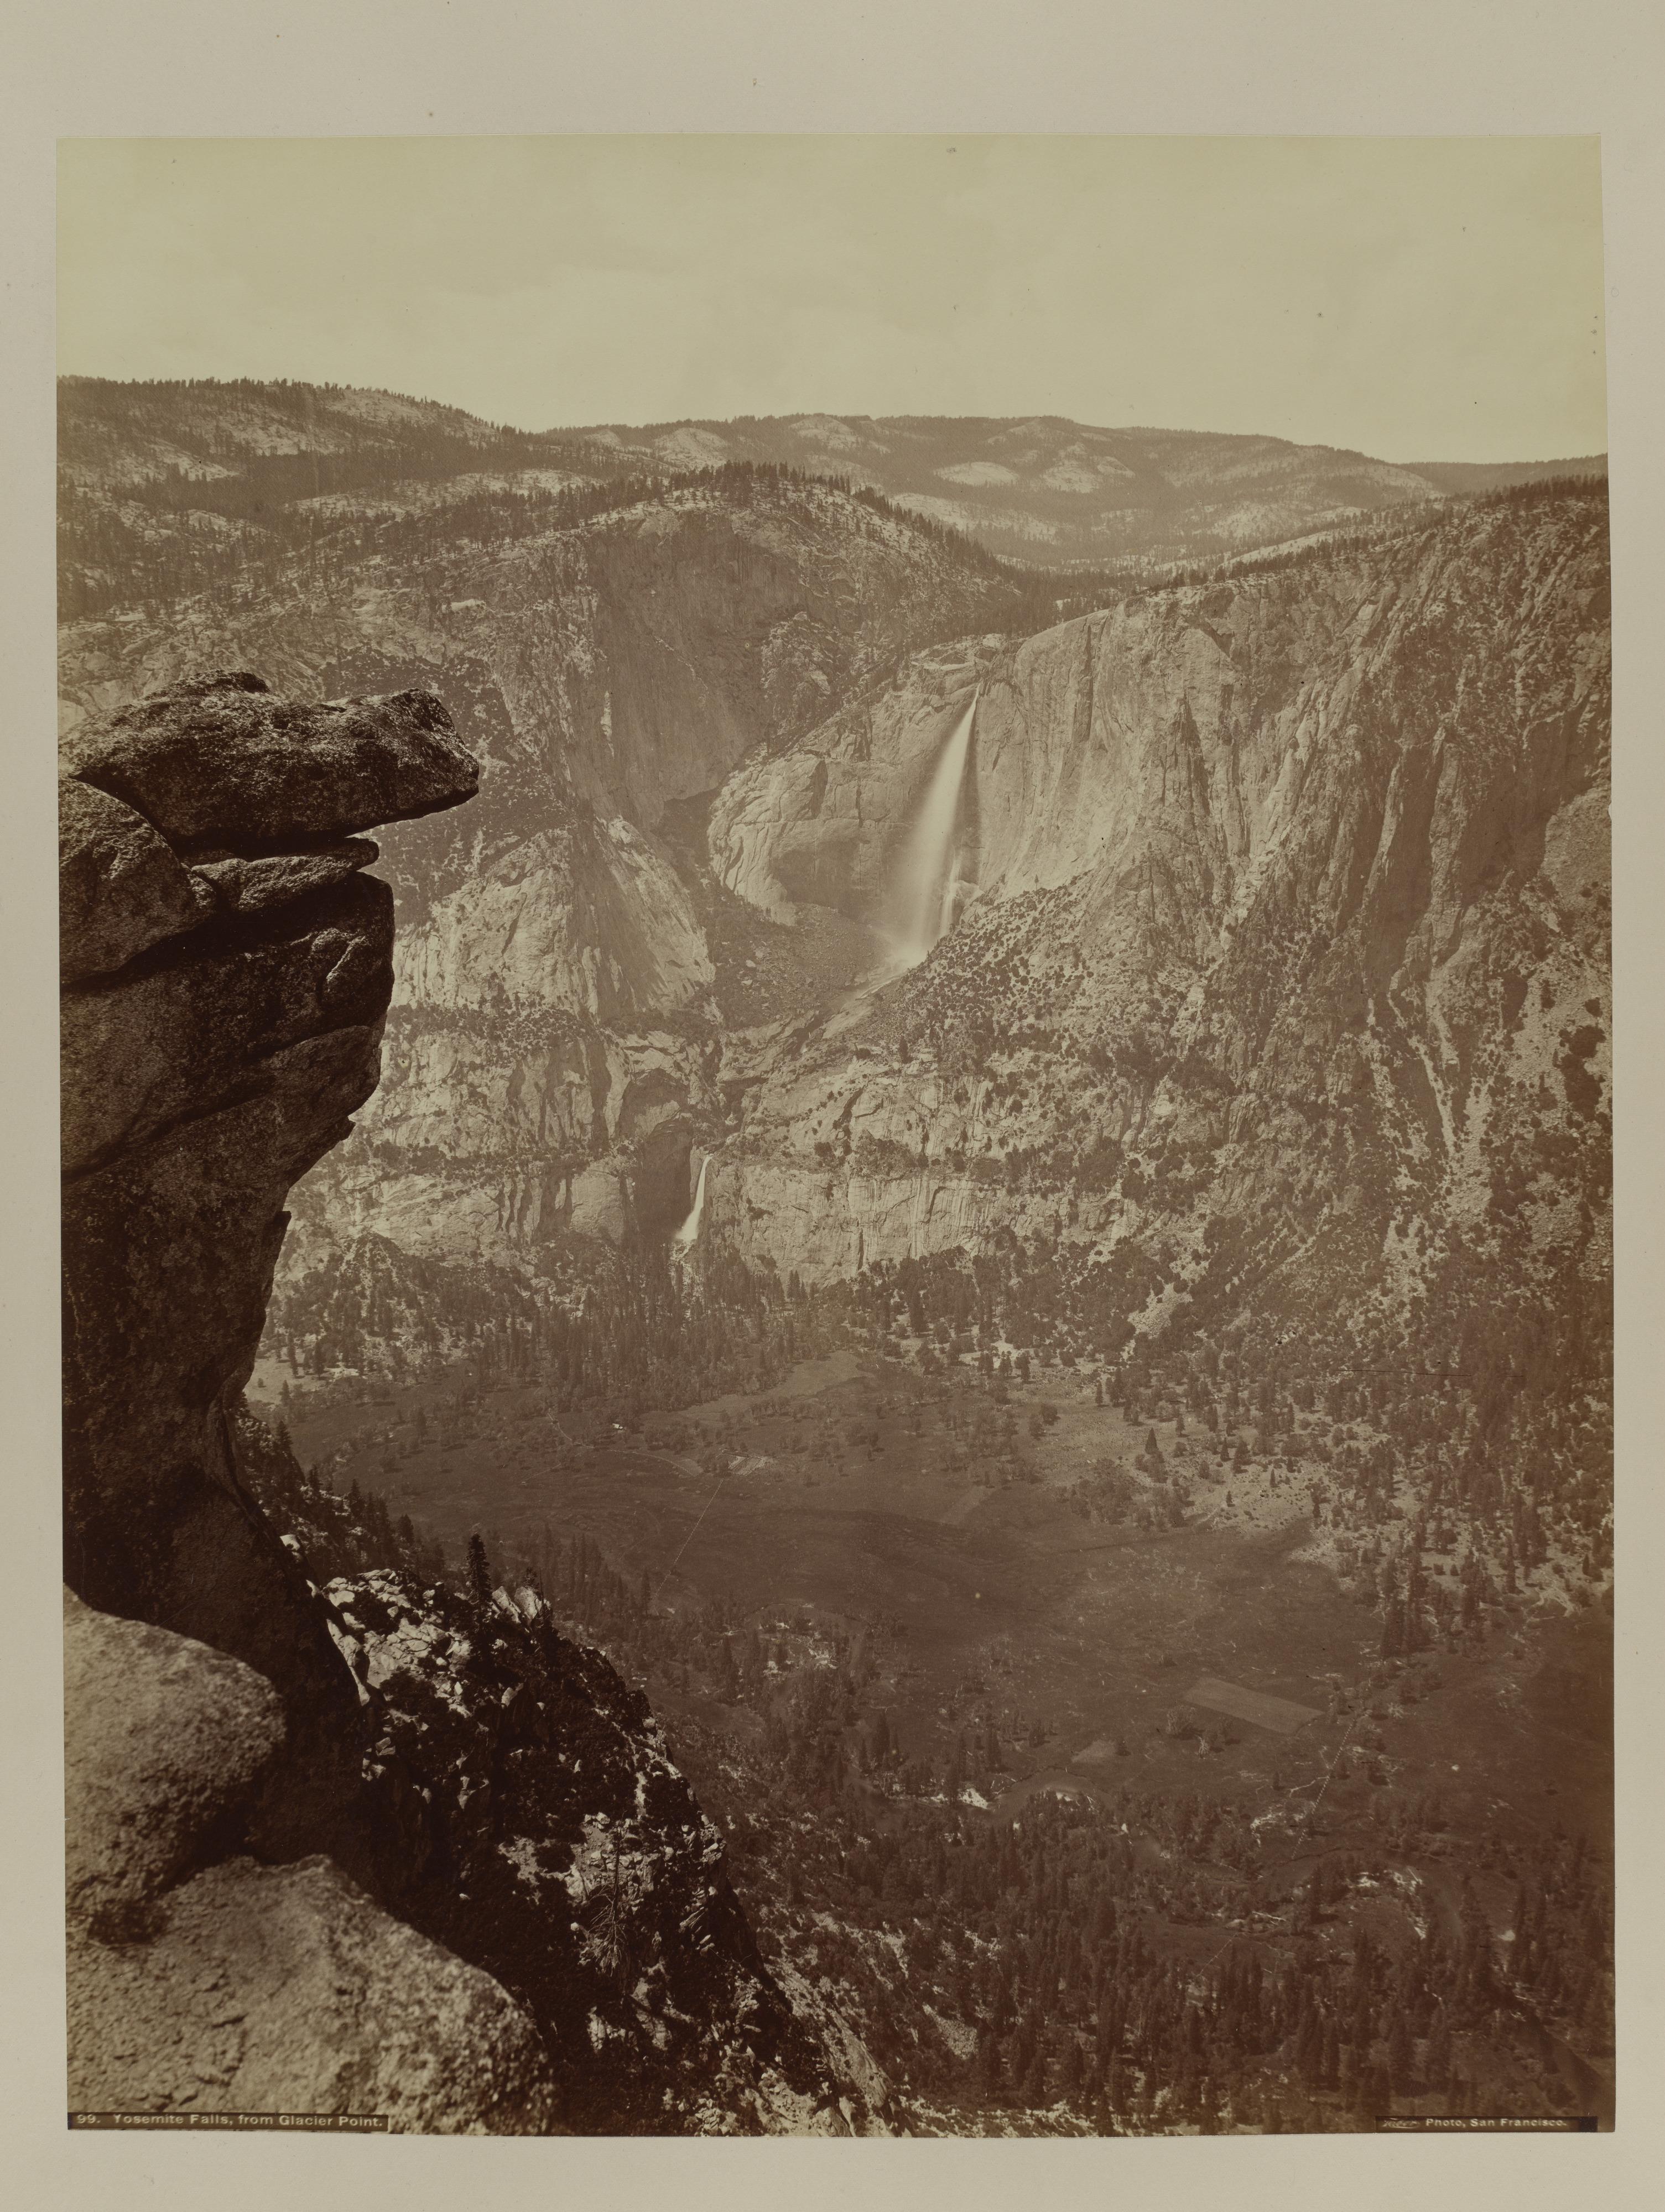 Fotó: Carleton Watkins: Yosemite Falls from Glacier Point, 1865–66, printed ca. 1875 © Carleton Watkins / The Metropolitan Museum of Art